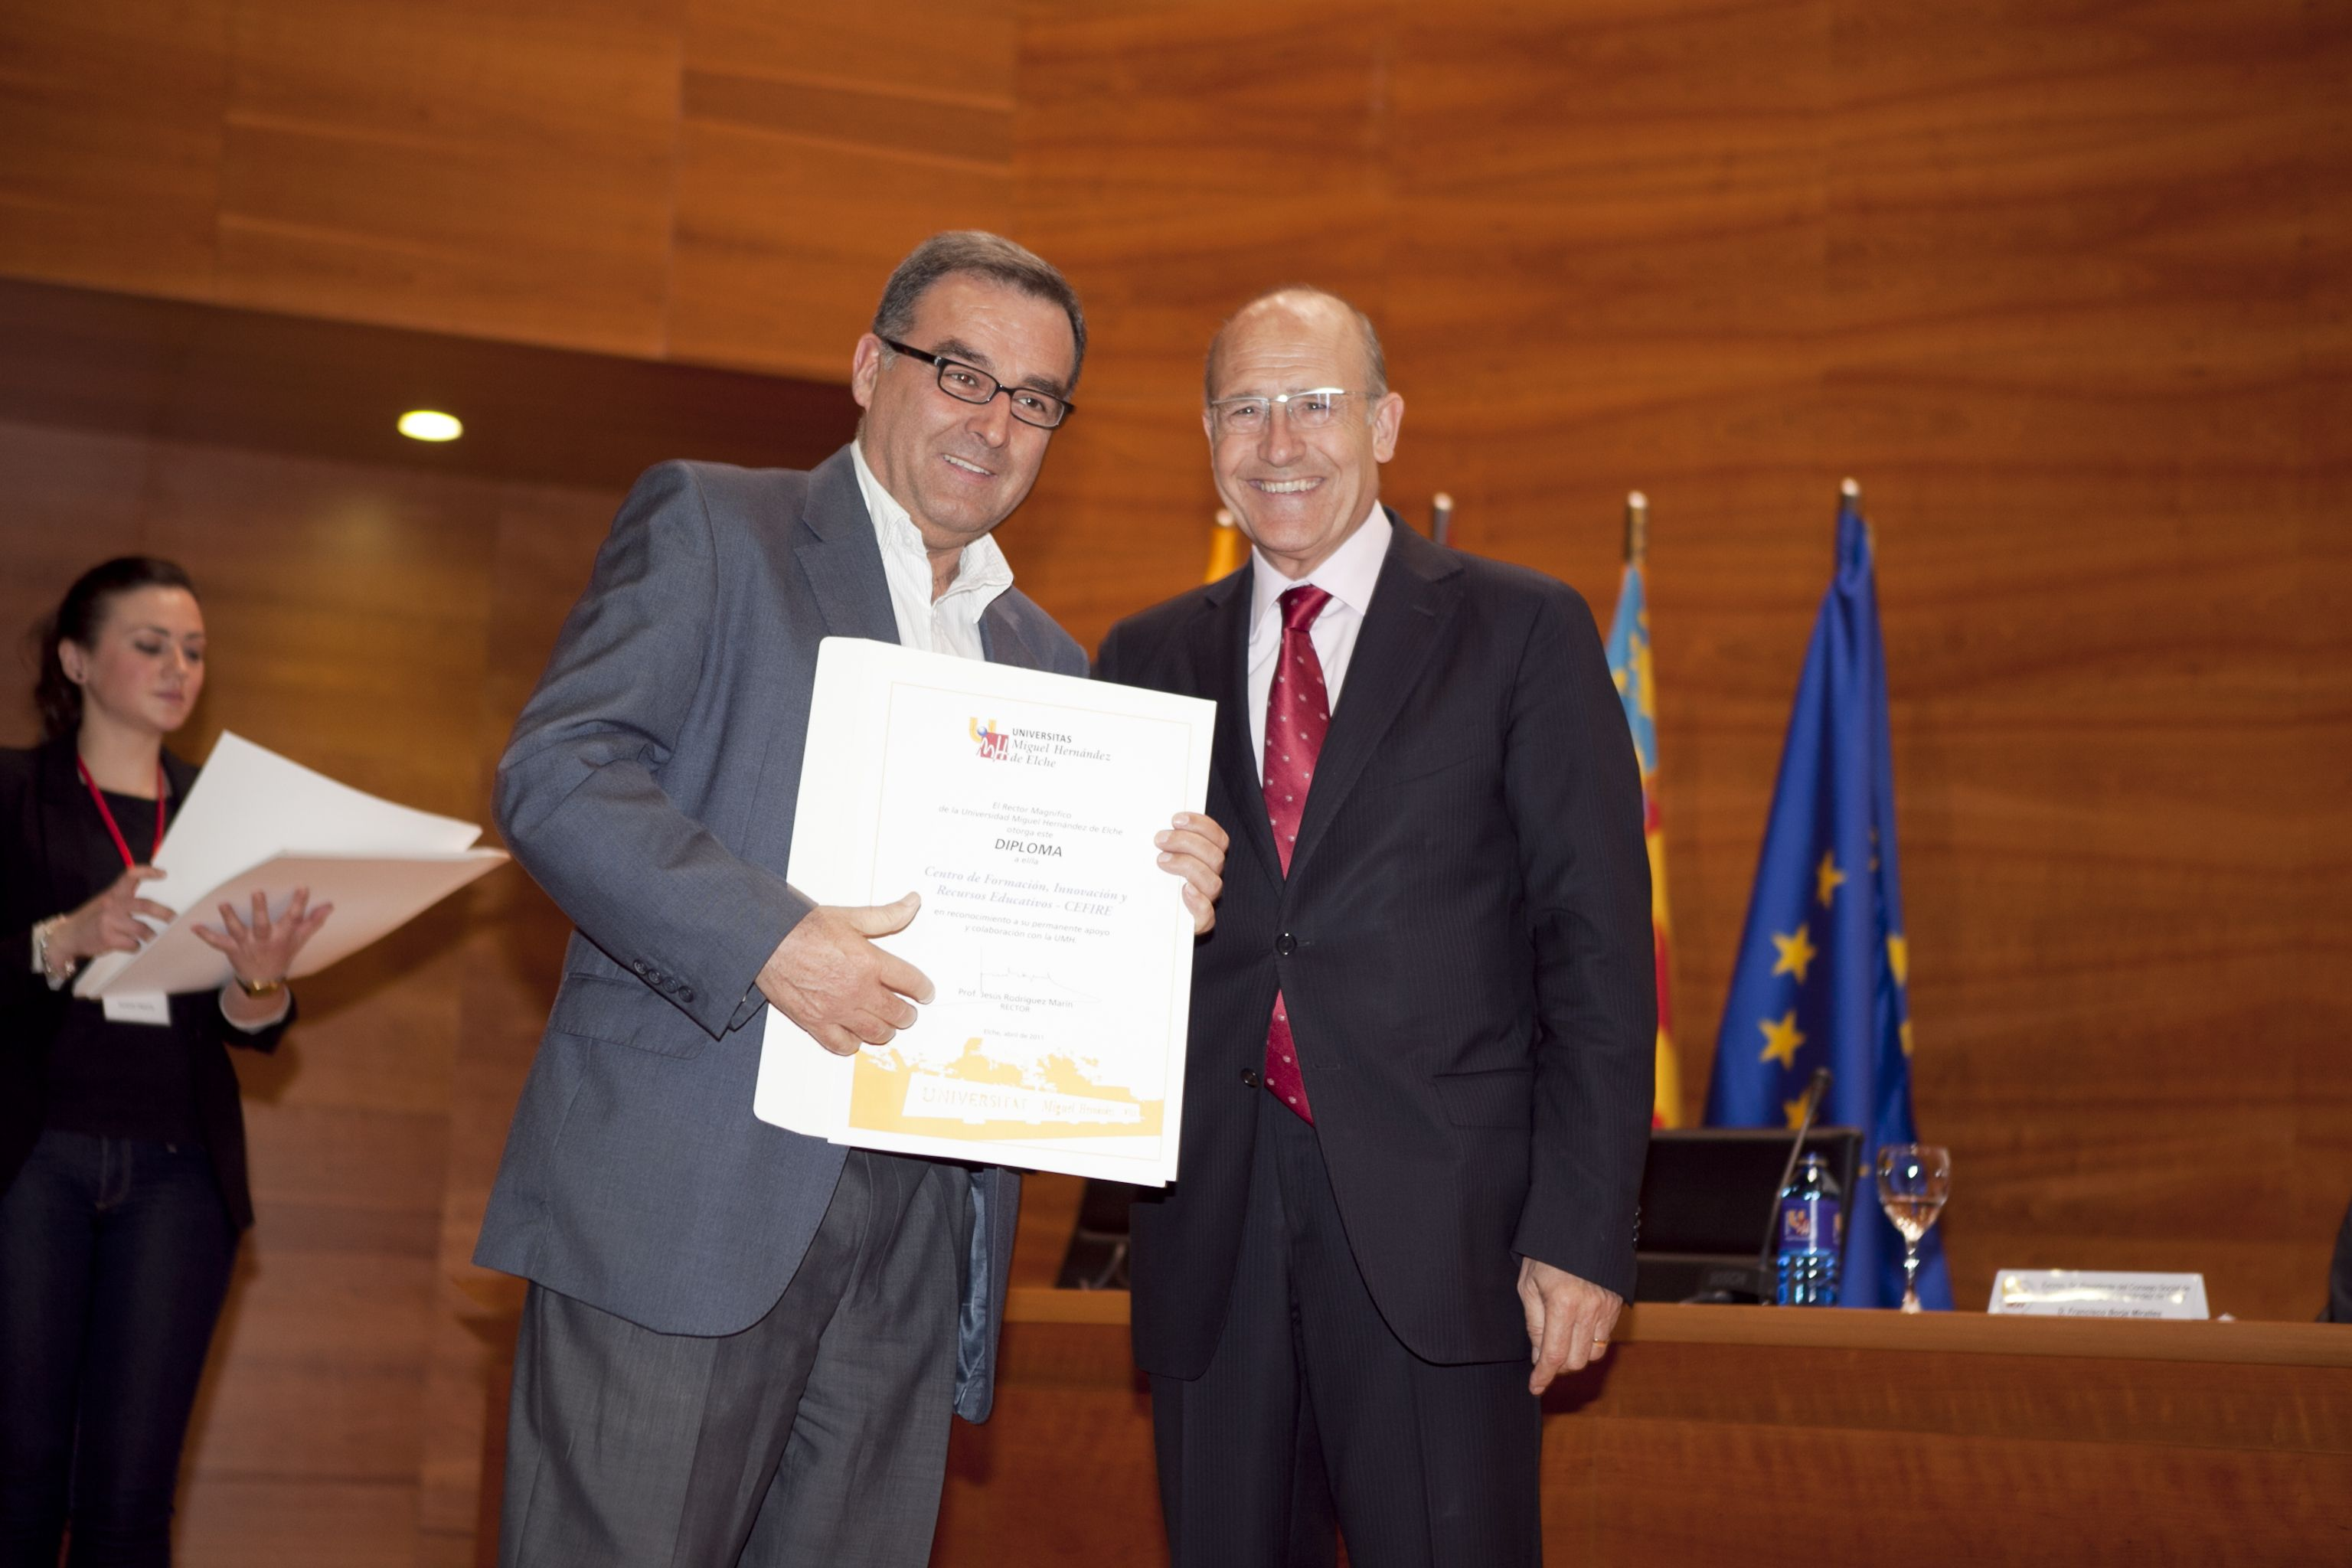 umh-diplomas-rector_mg_6692.jpg